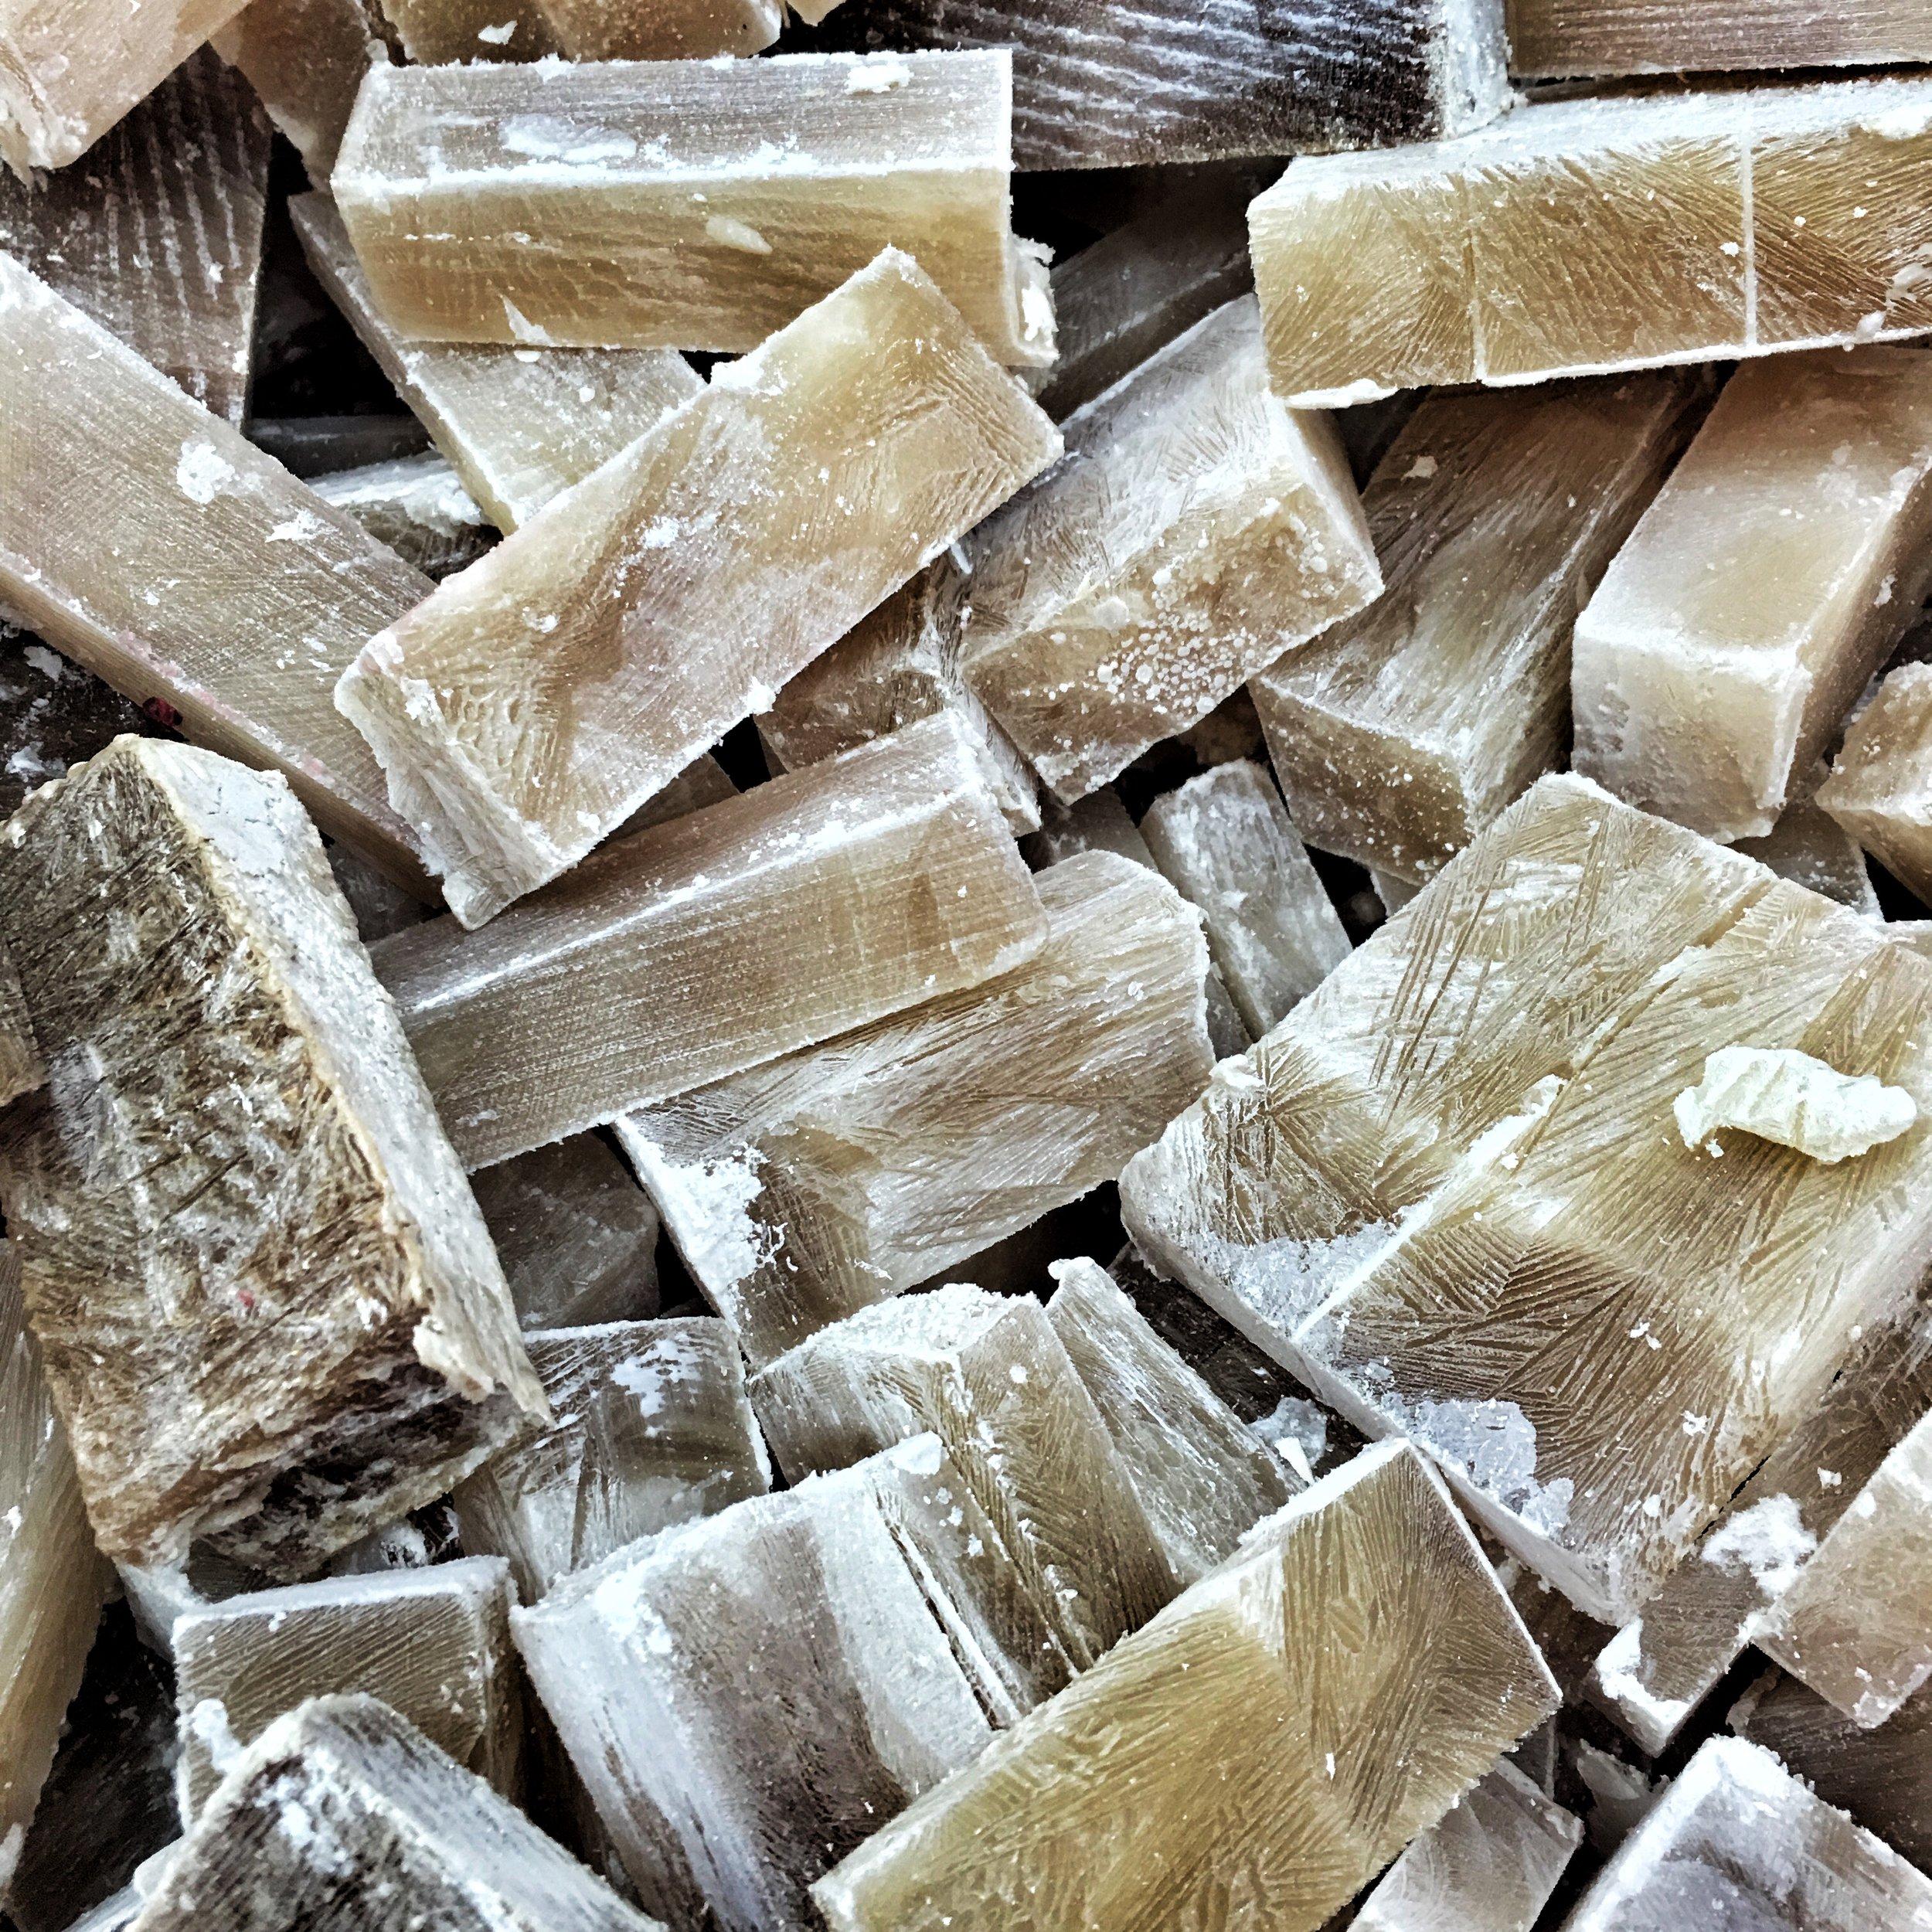 Frozen cubes of beef bouillon.